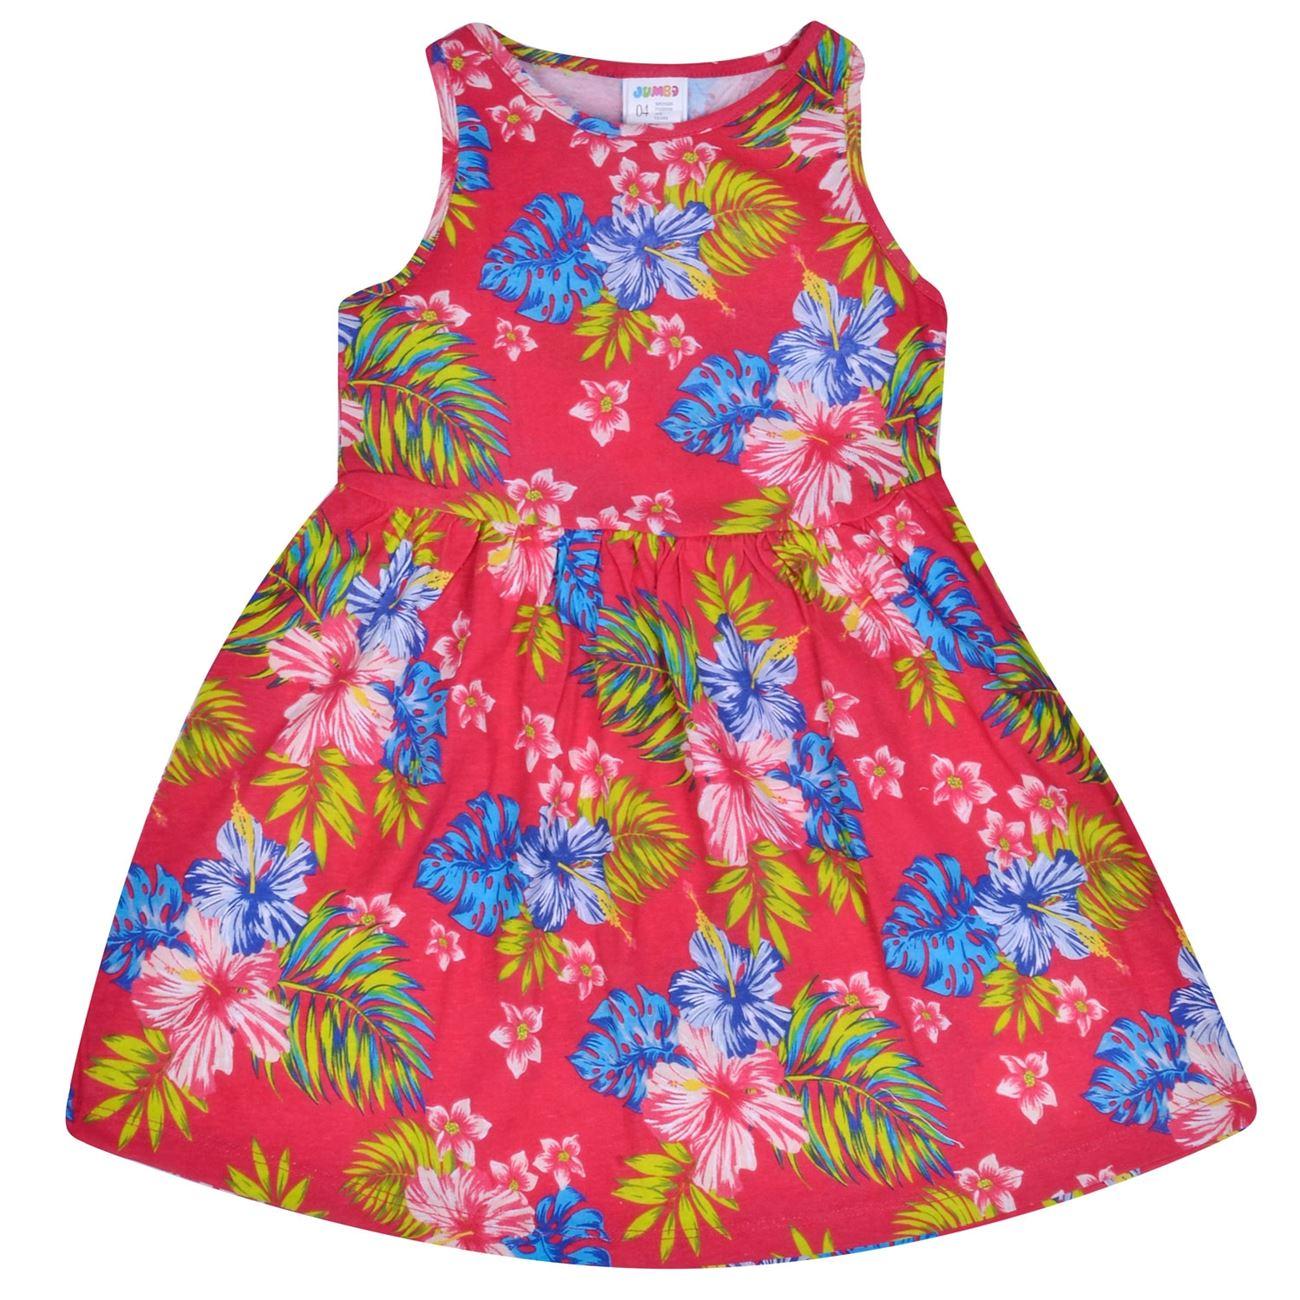 4fa620847bd0 Φόρεμα Αμάνικο Παιδικό Κόκκινο Εμπριμέ   Φορέματα για Κορίτσια